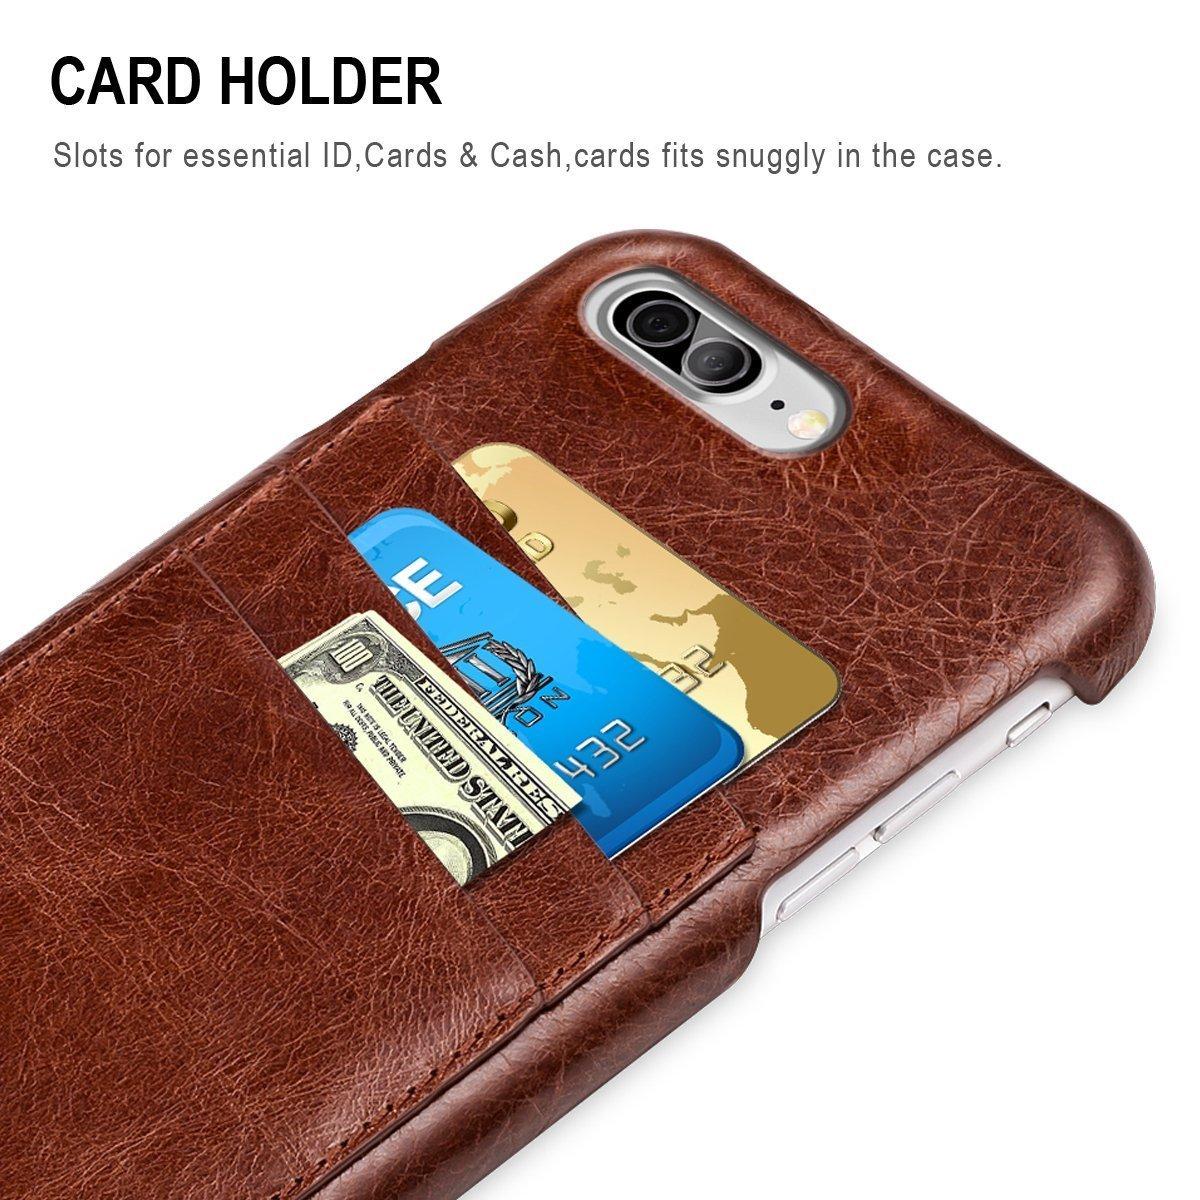 $8.74  iPhone 8/7 Plus | iPhone 8/7  |  iPhone 6/ 6s Plus | iPhone 6/6s  Ultra Slim Genuine Leather Card Case-Free Shipping @Amazon  $8.74 w/ Promotion Code:  U9KXQ9UZ $8.72